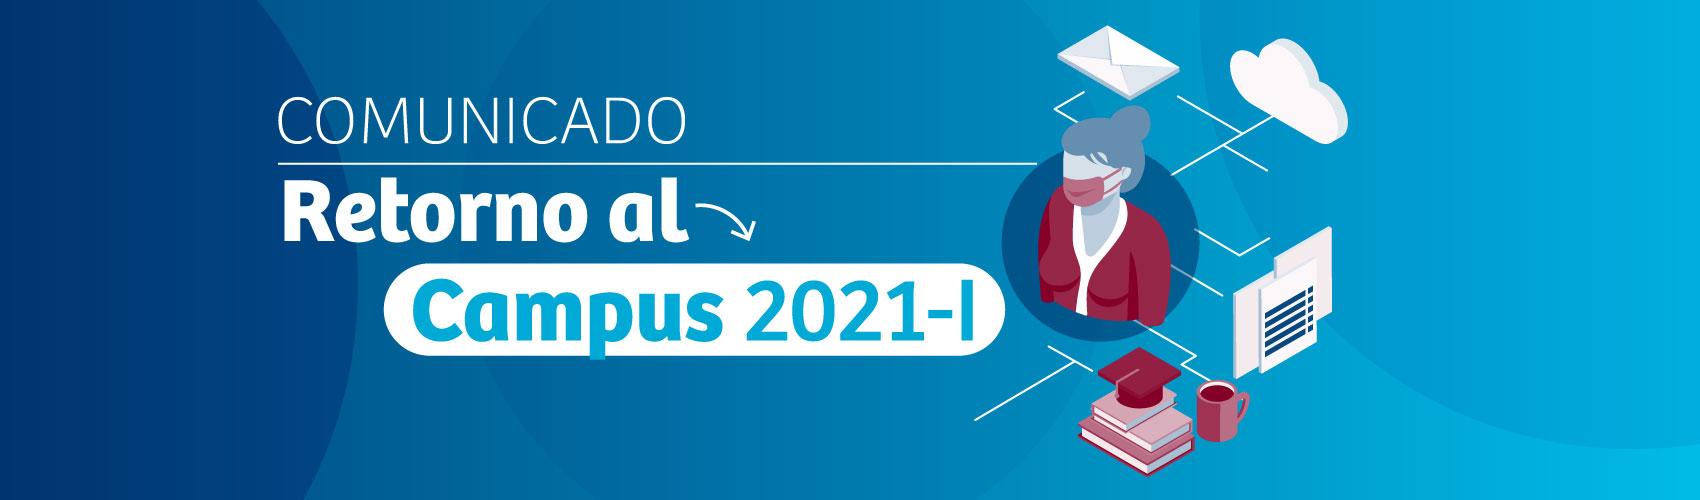 header-retorno-2021-upc